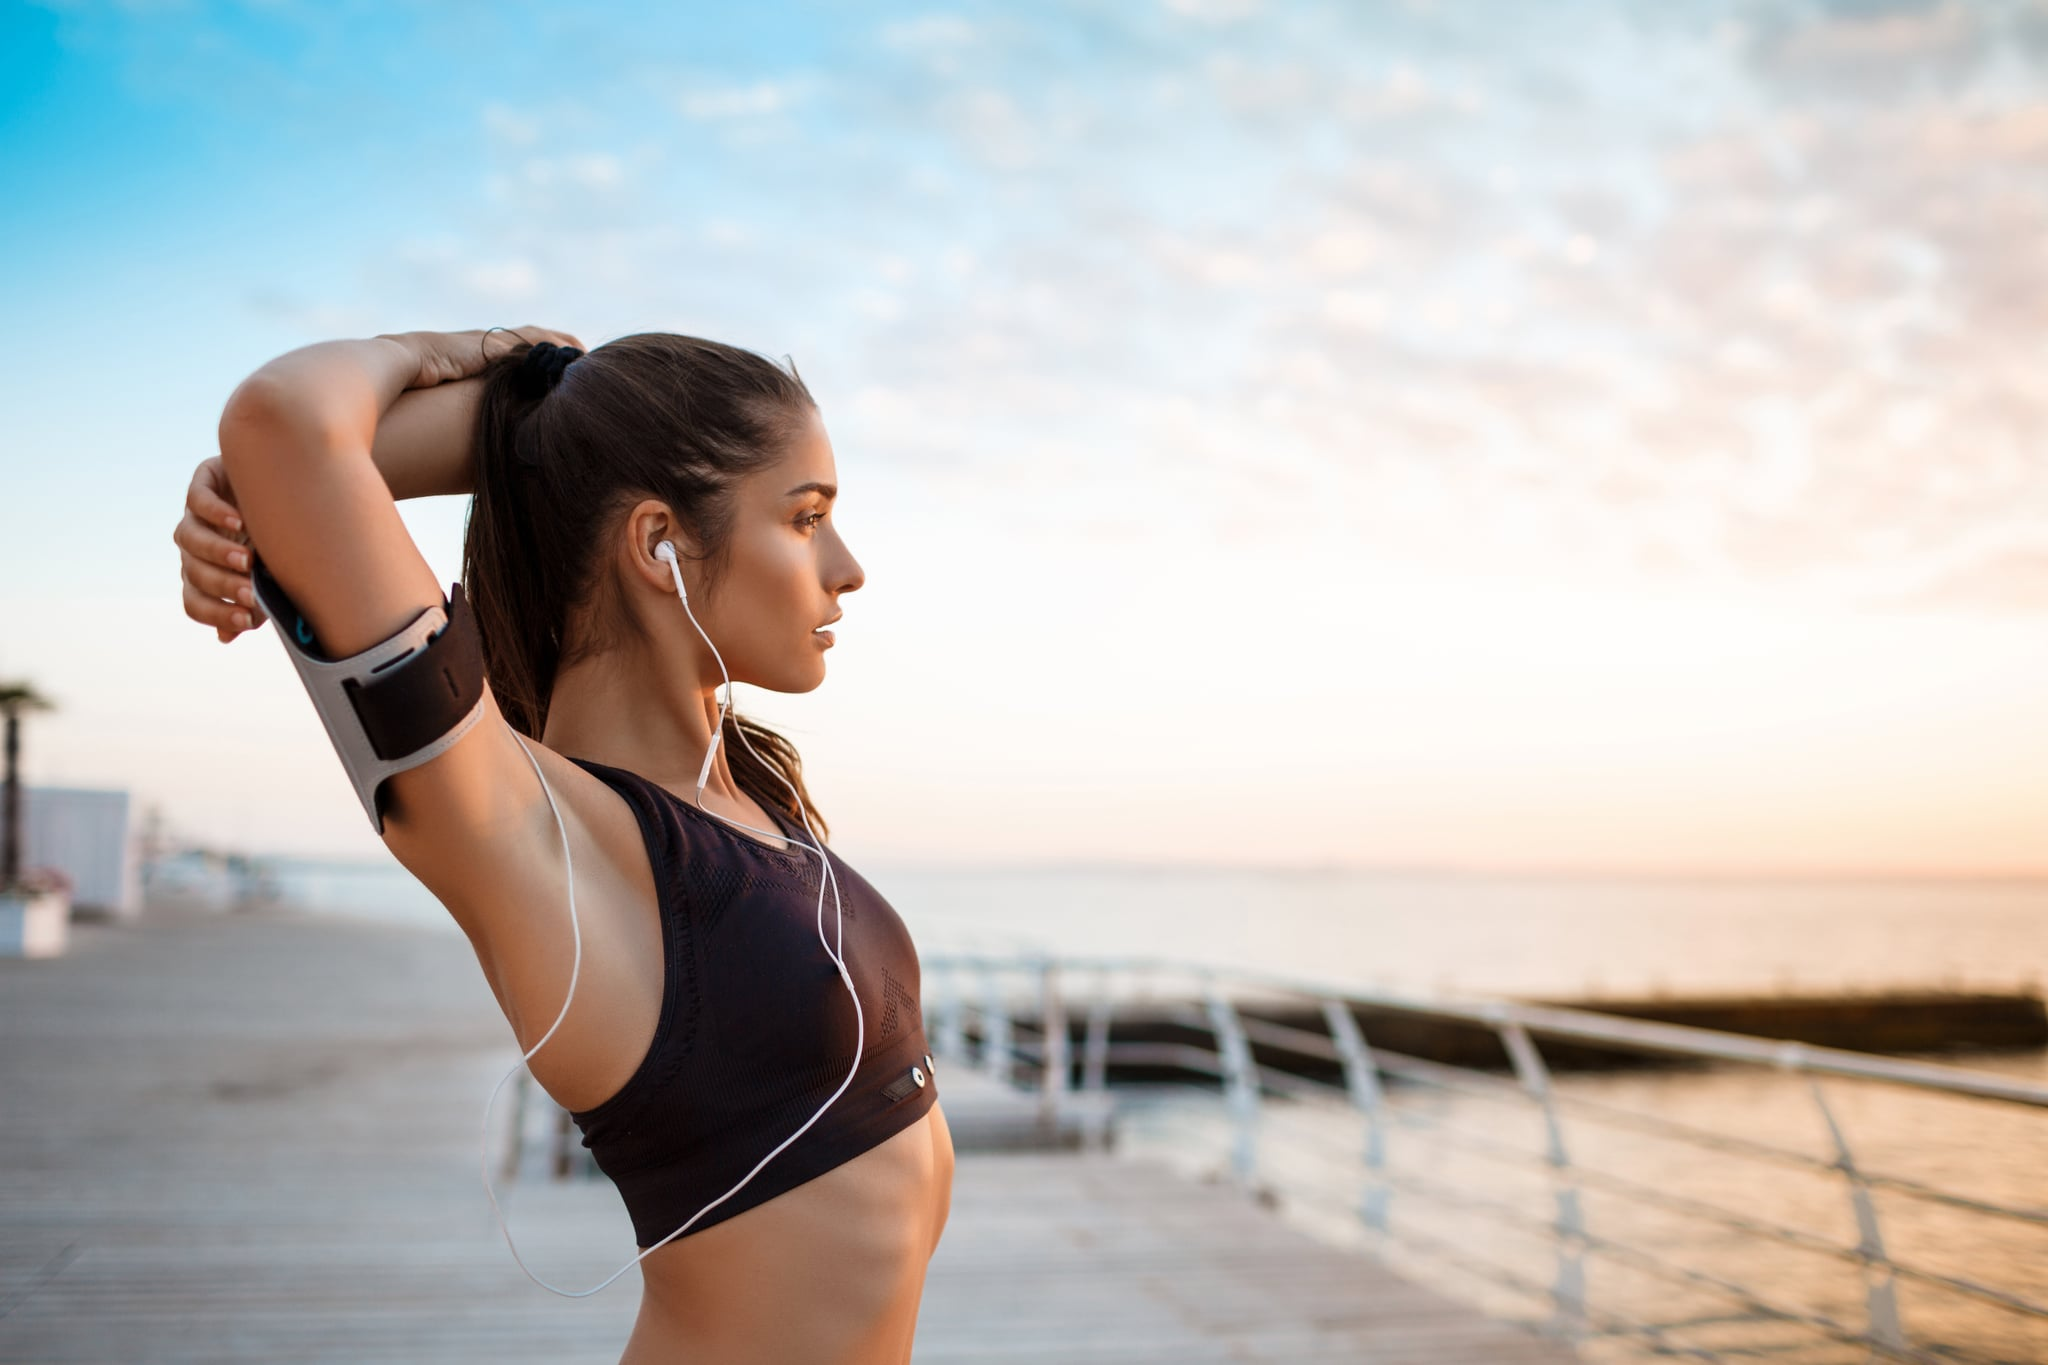 tips for being a better runner